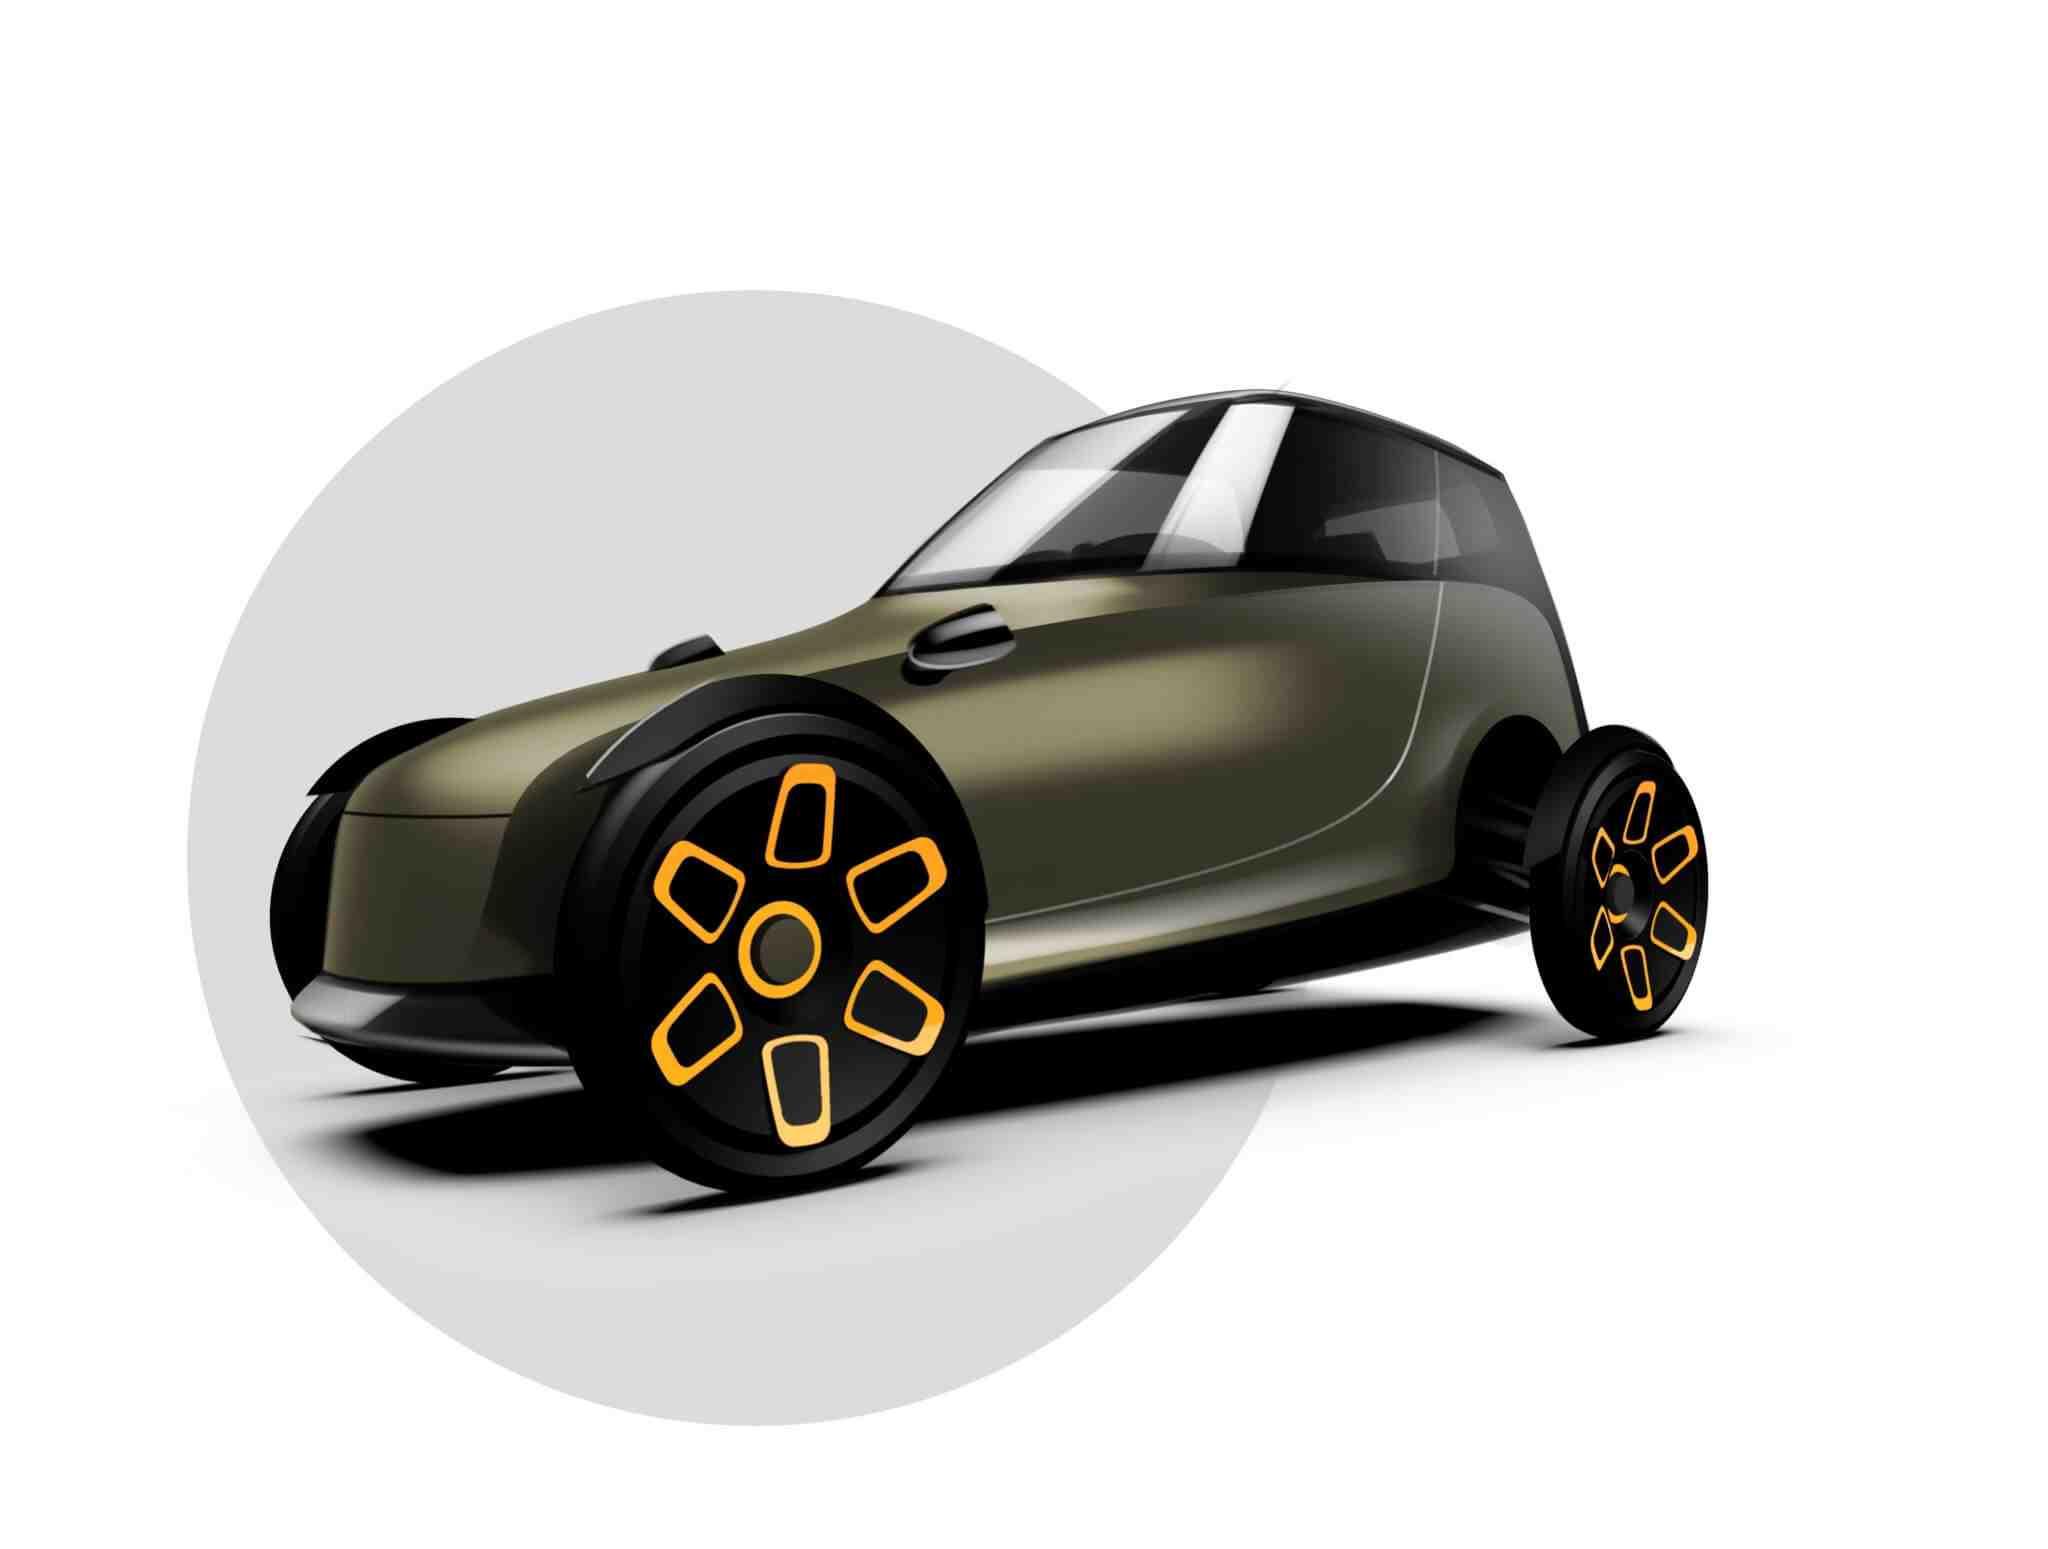 Yks1 schets microauto mobiliteit